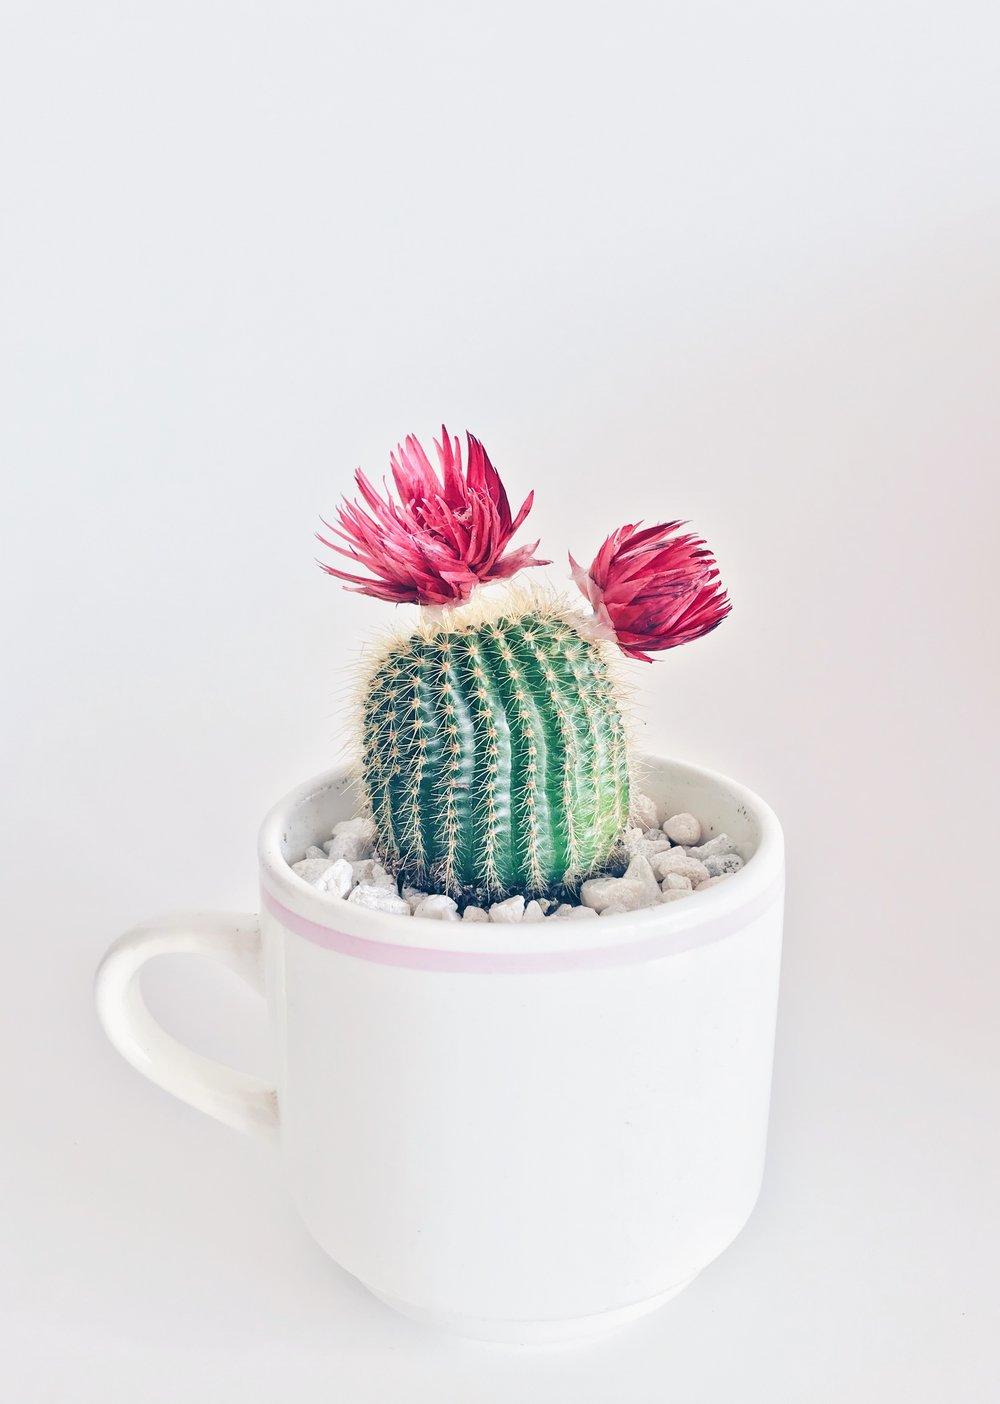 When you love man whos cactus